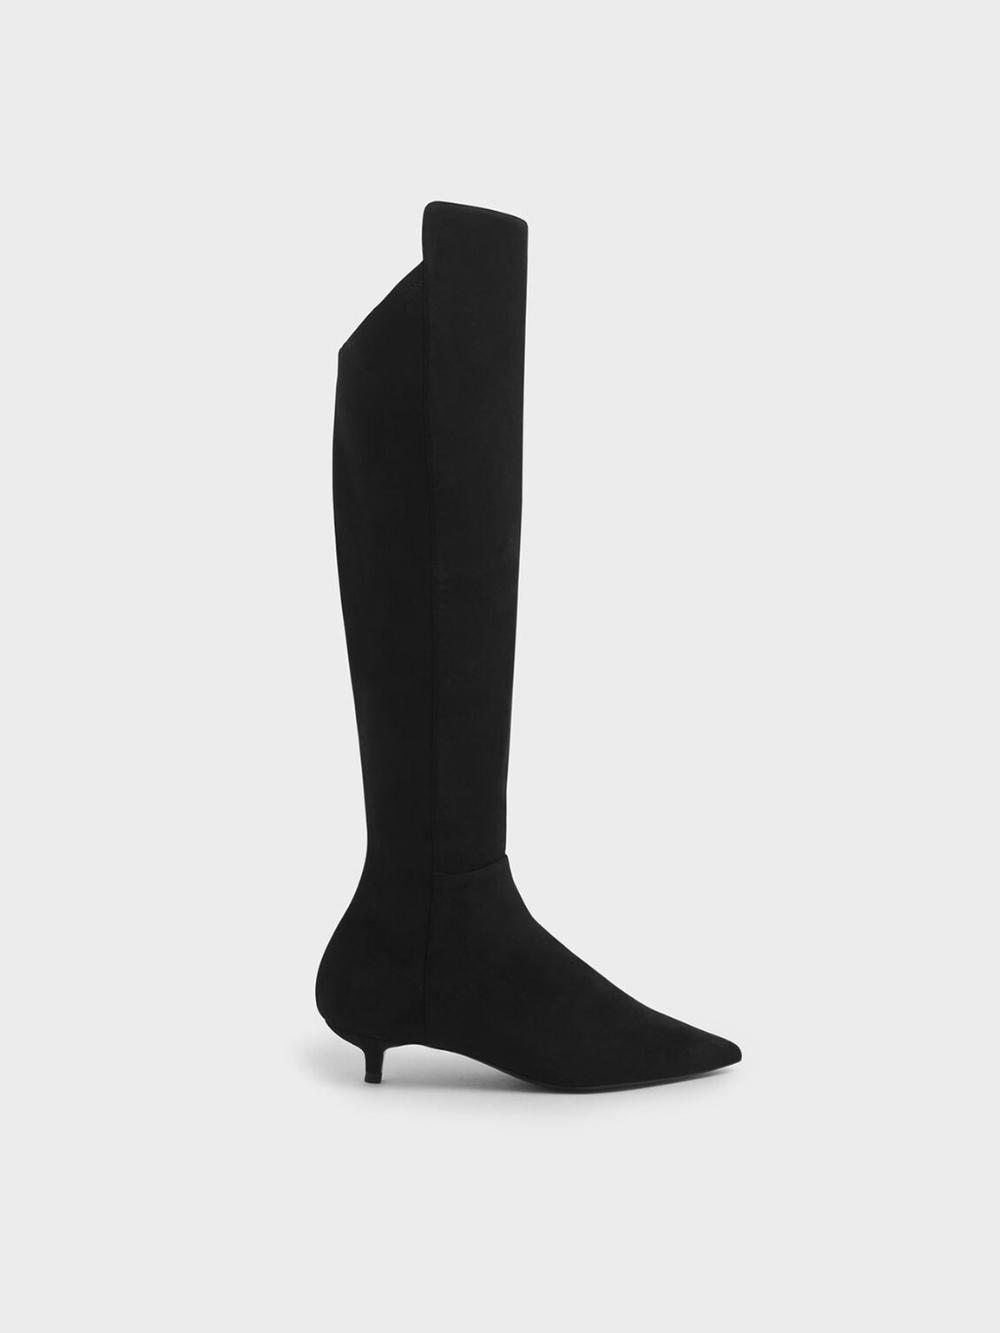 Taupe Textured Kitten Heel Knee High Boots In 2020 Kitten Heel Boots Boots Taupe Knee High Boots